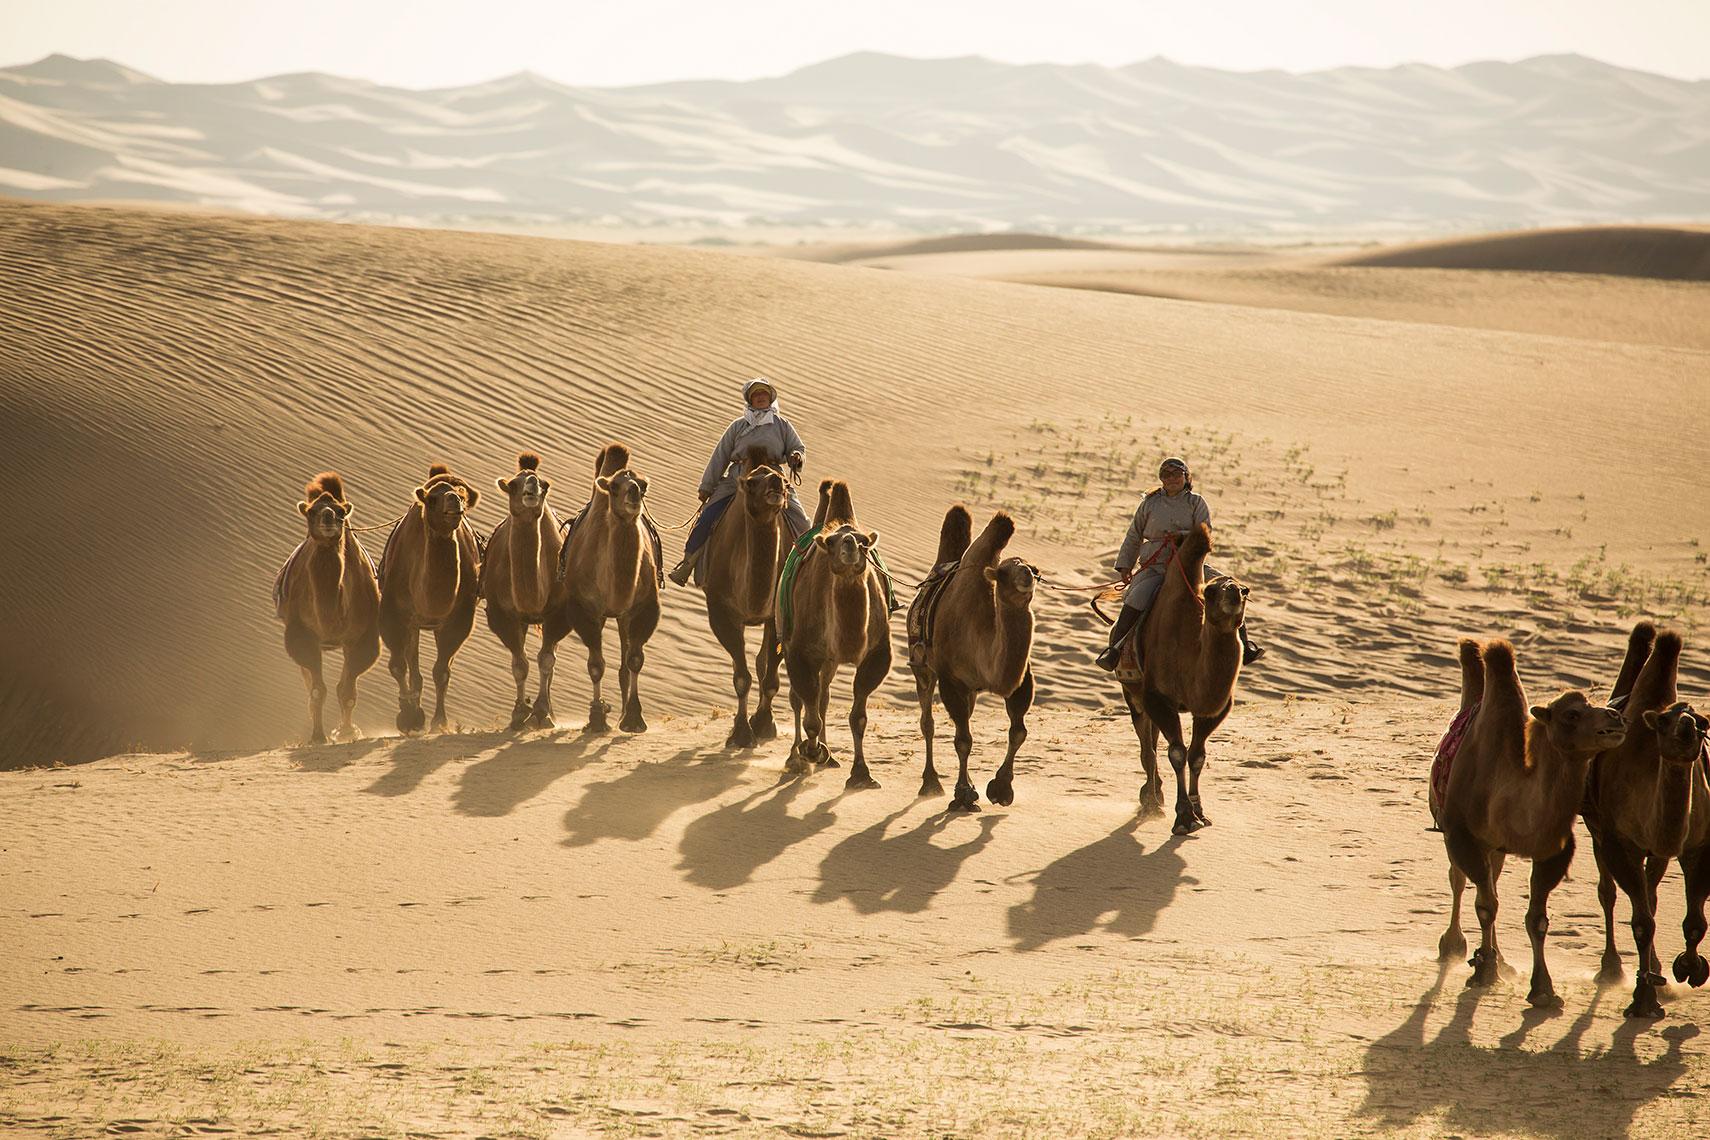 Gobi Desert. Photo courtesy of Ira Block Photography